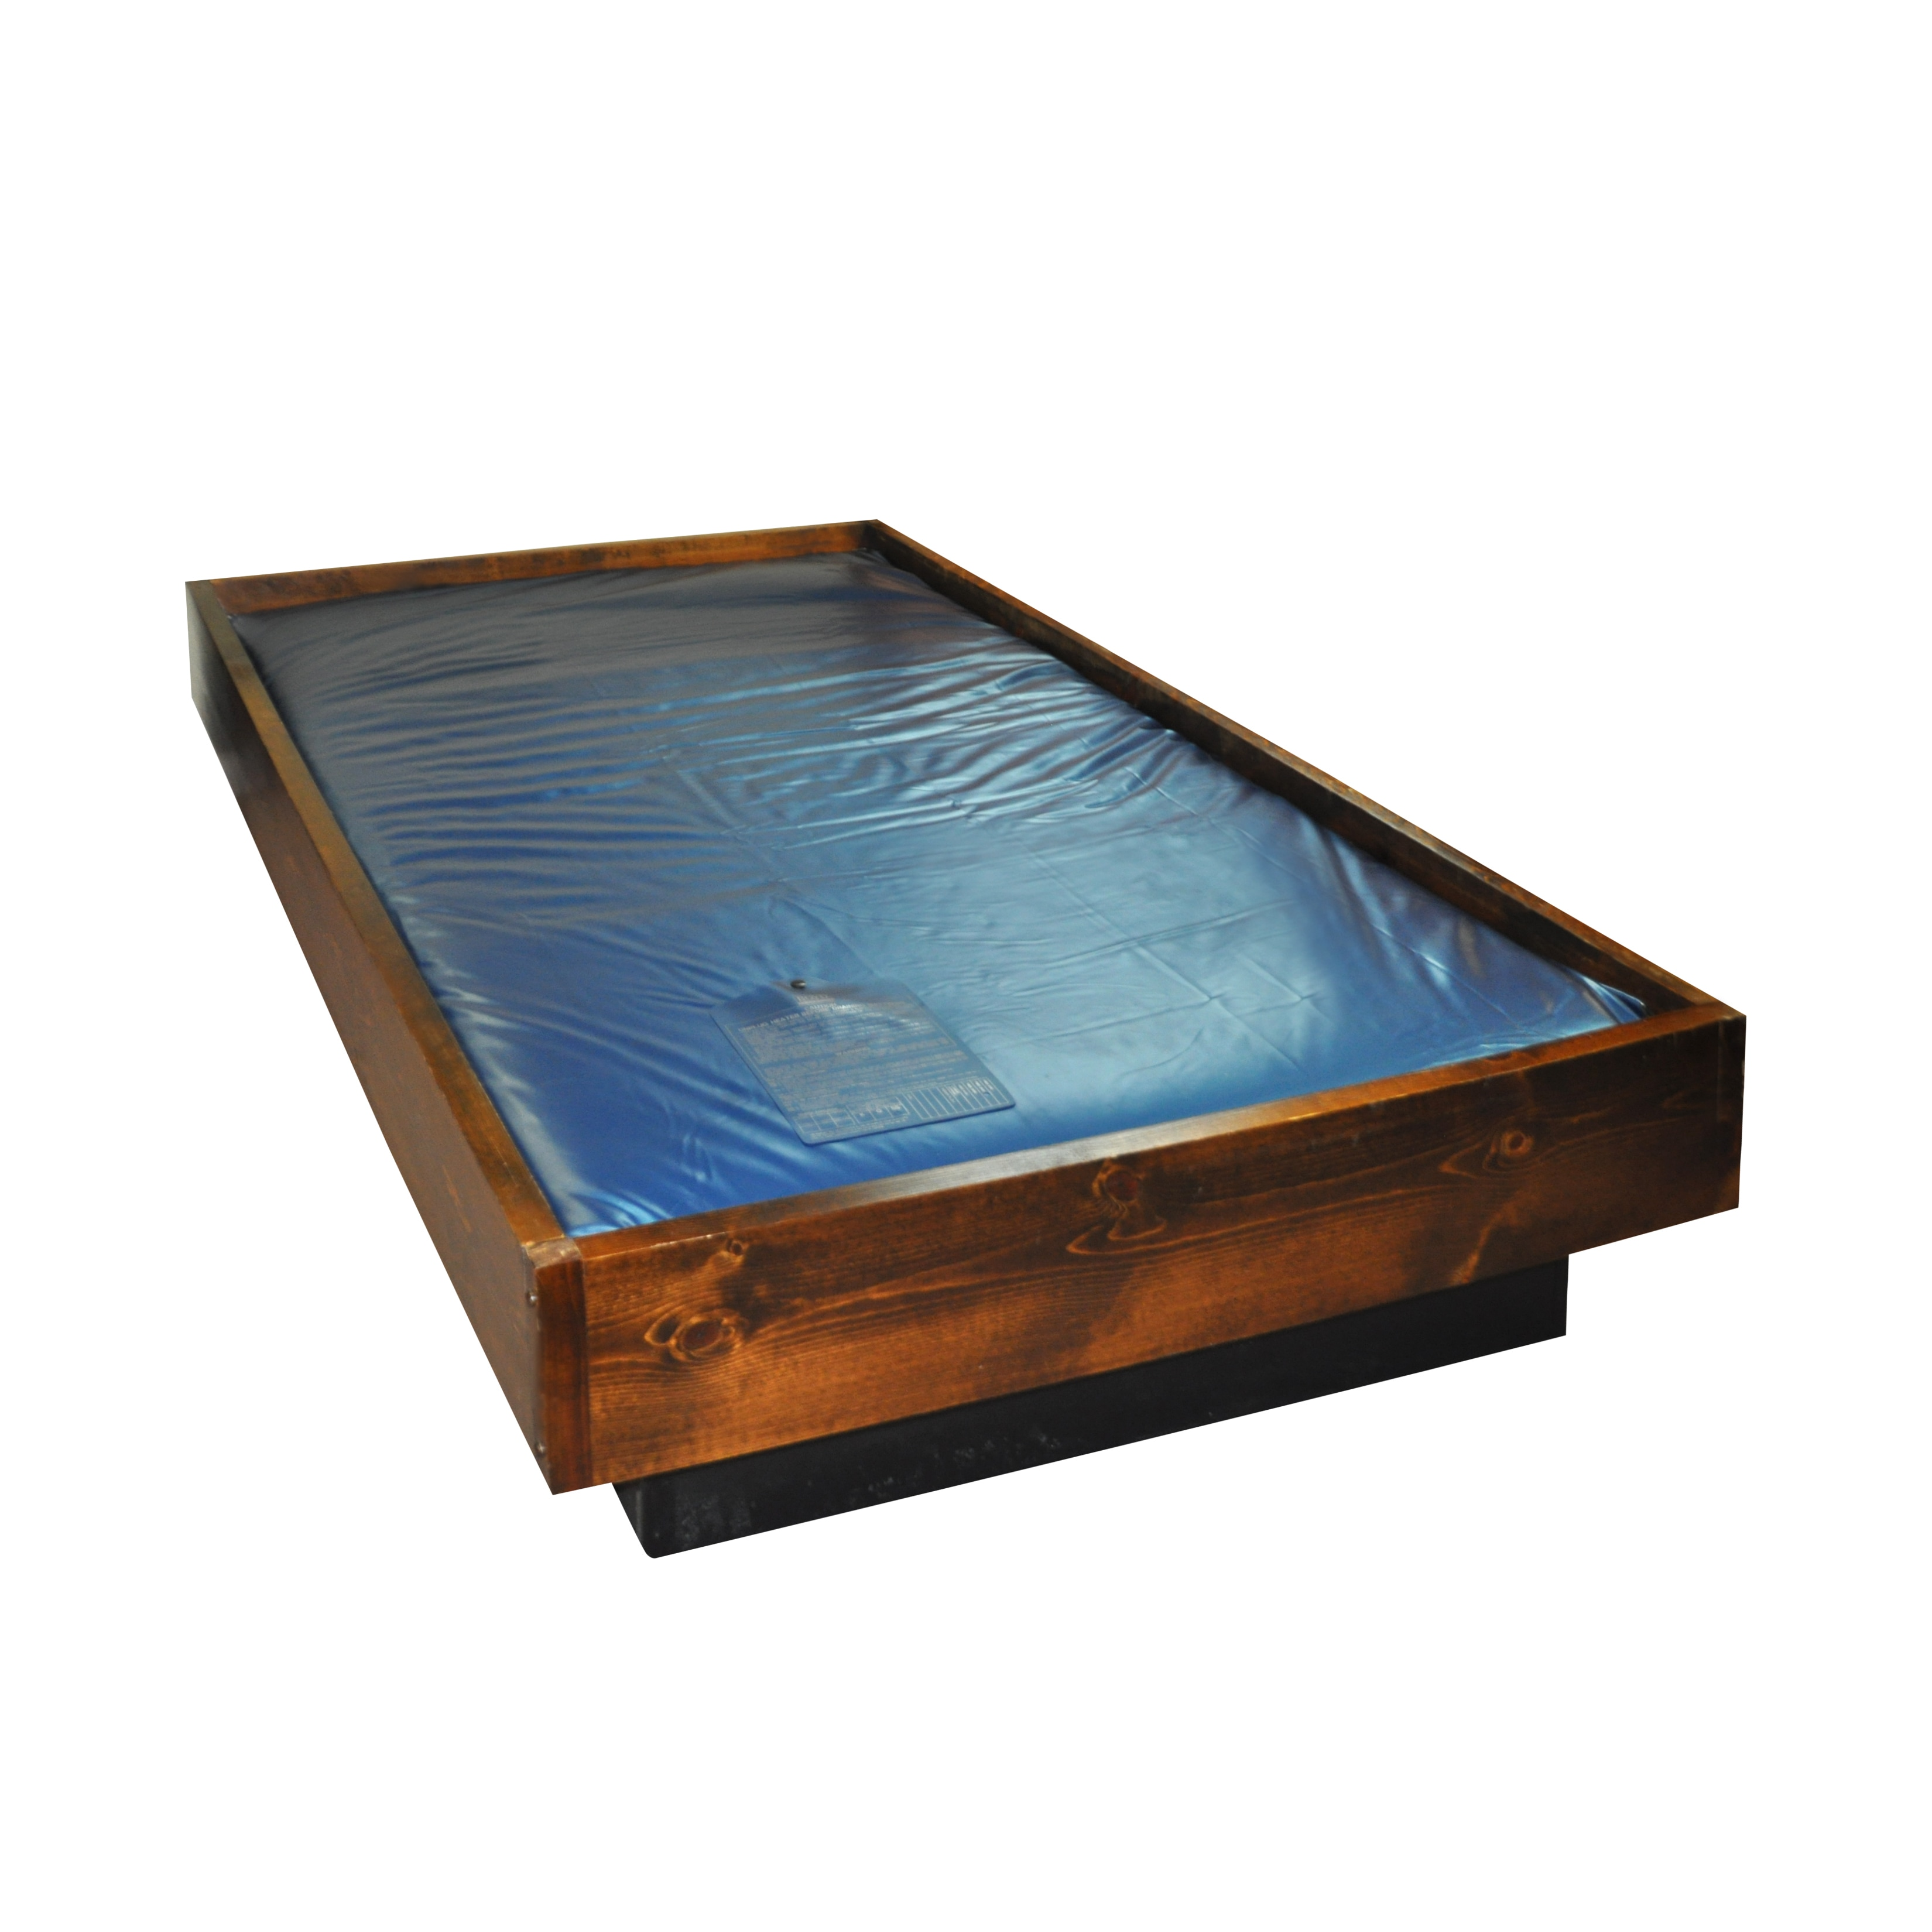 Sleep Sync Fiber 35 King Size Waveless Waterbed Mattress